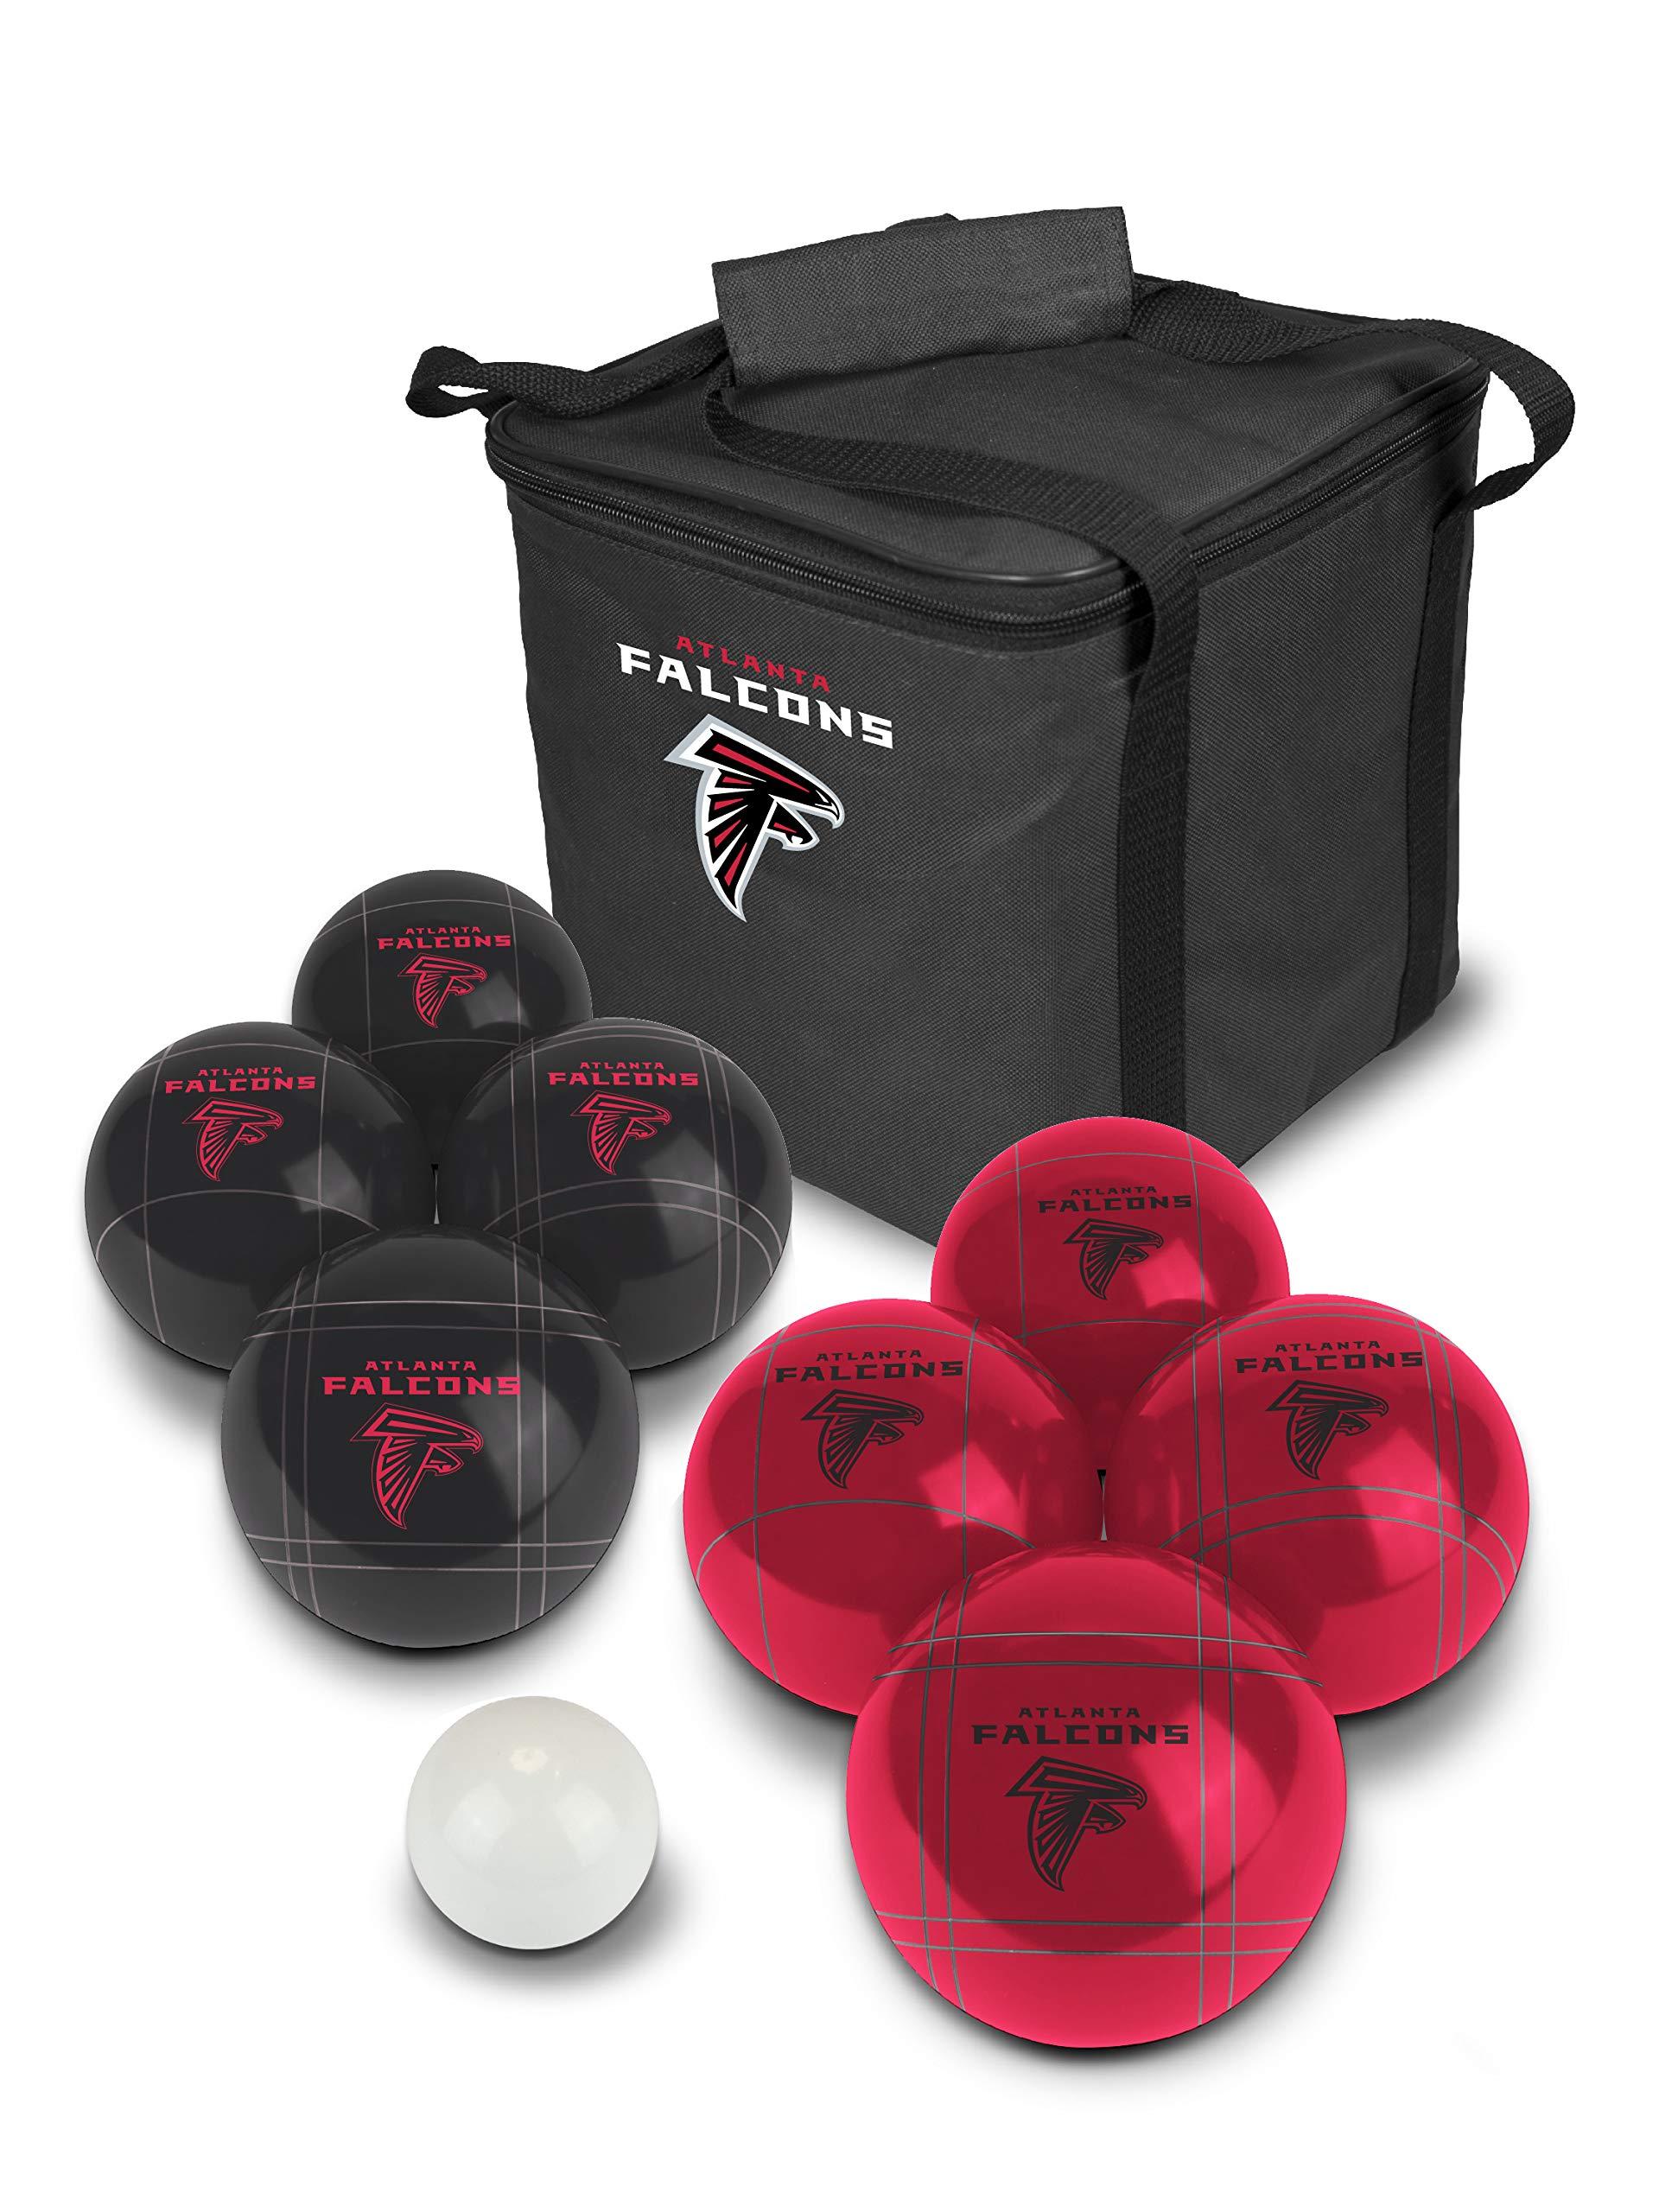 PROLINE NFL Atlanta Falcons Bocce Ball Set by PROLINE